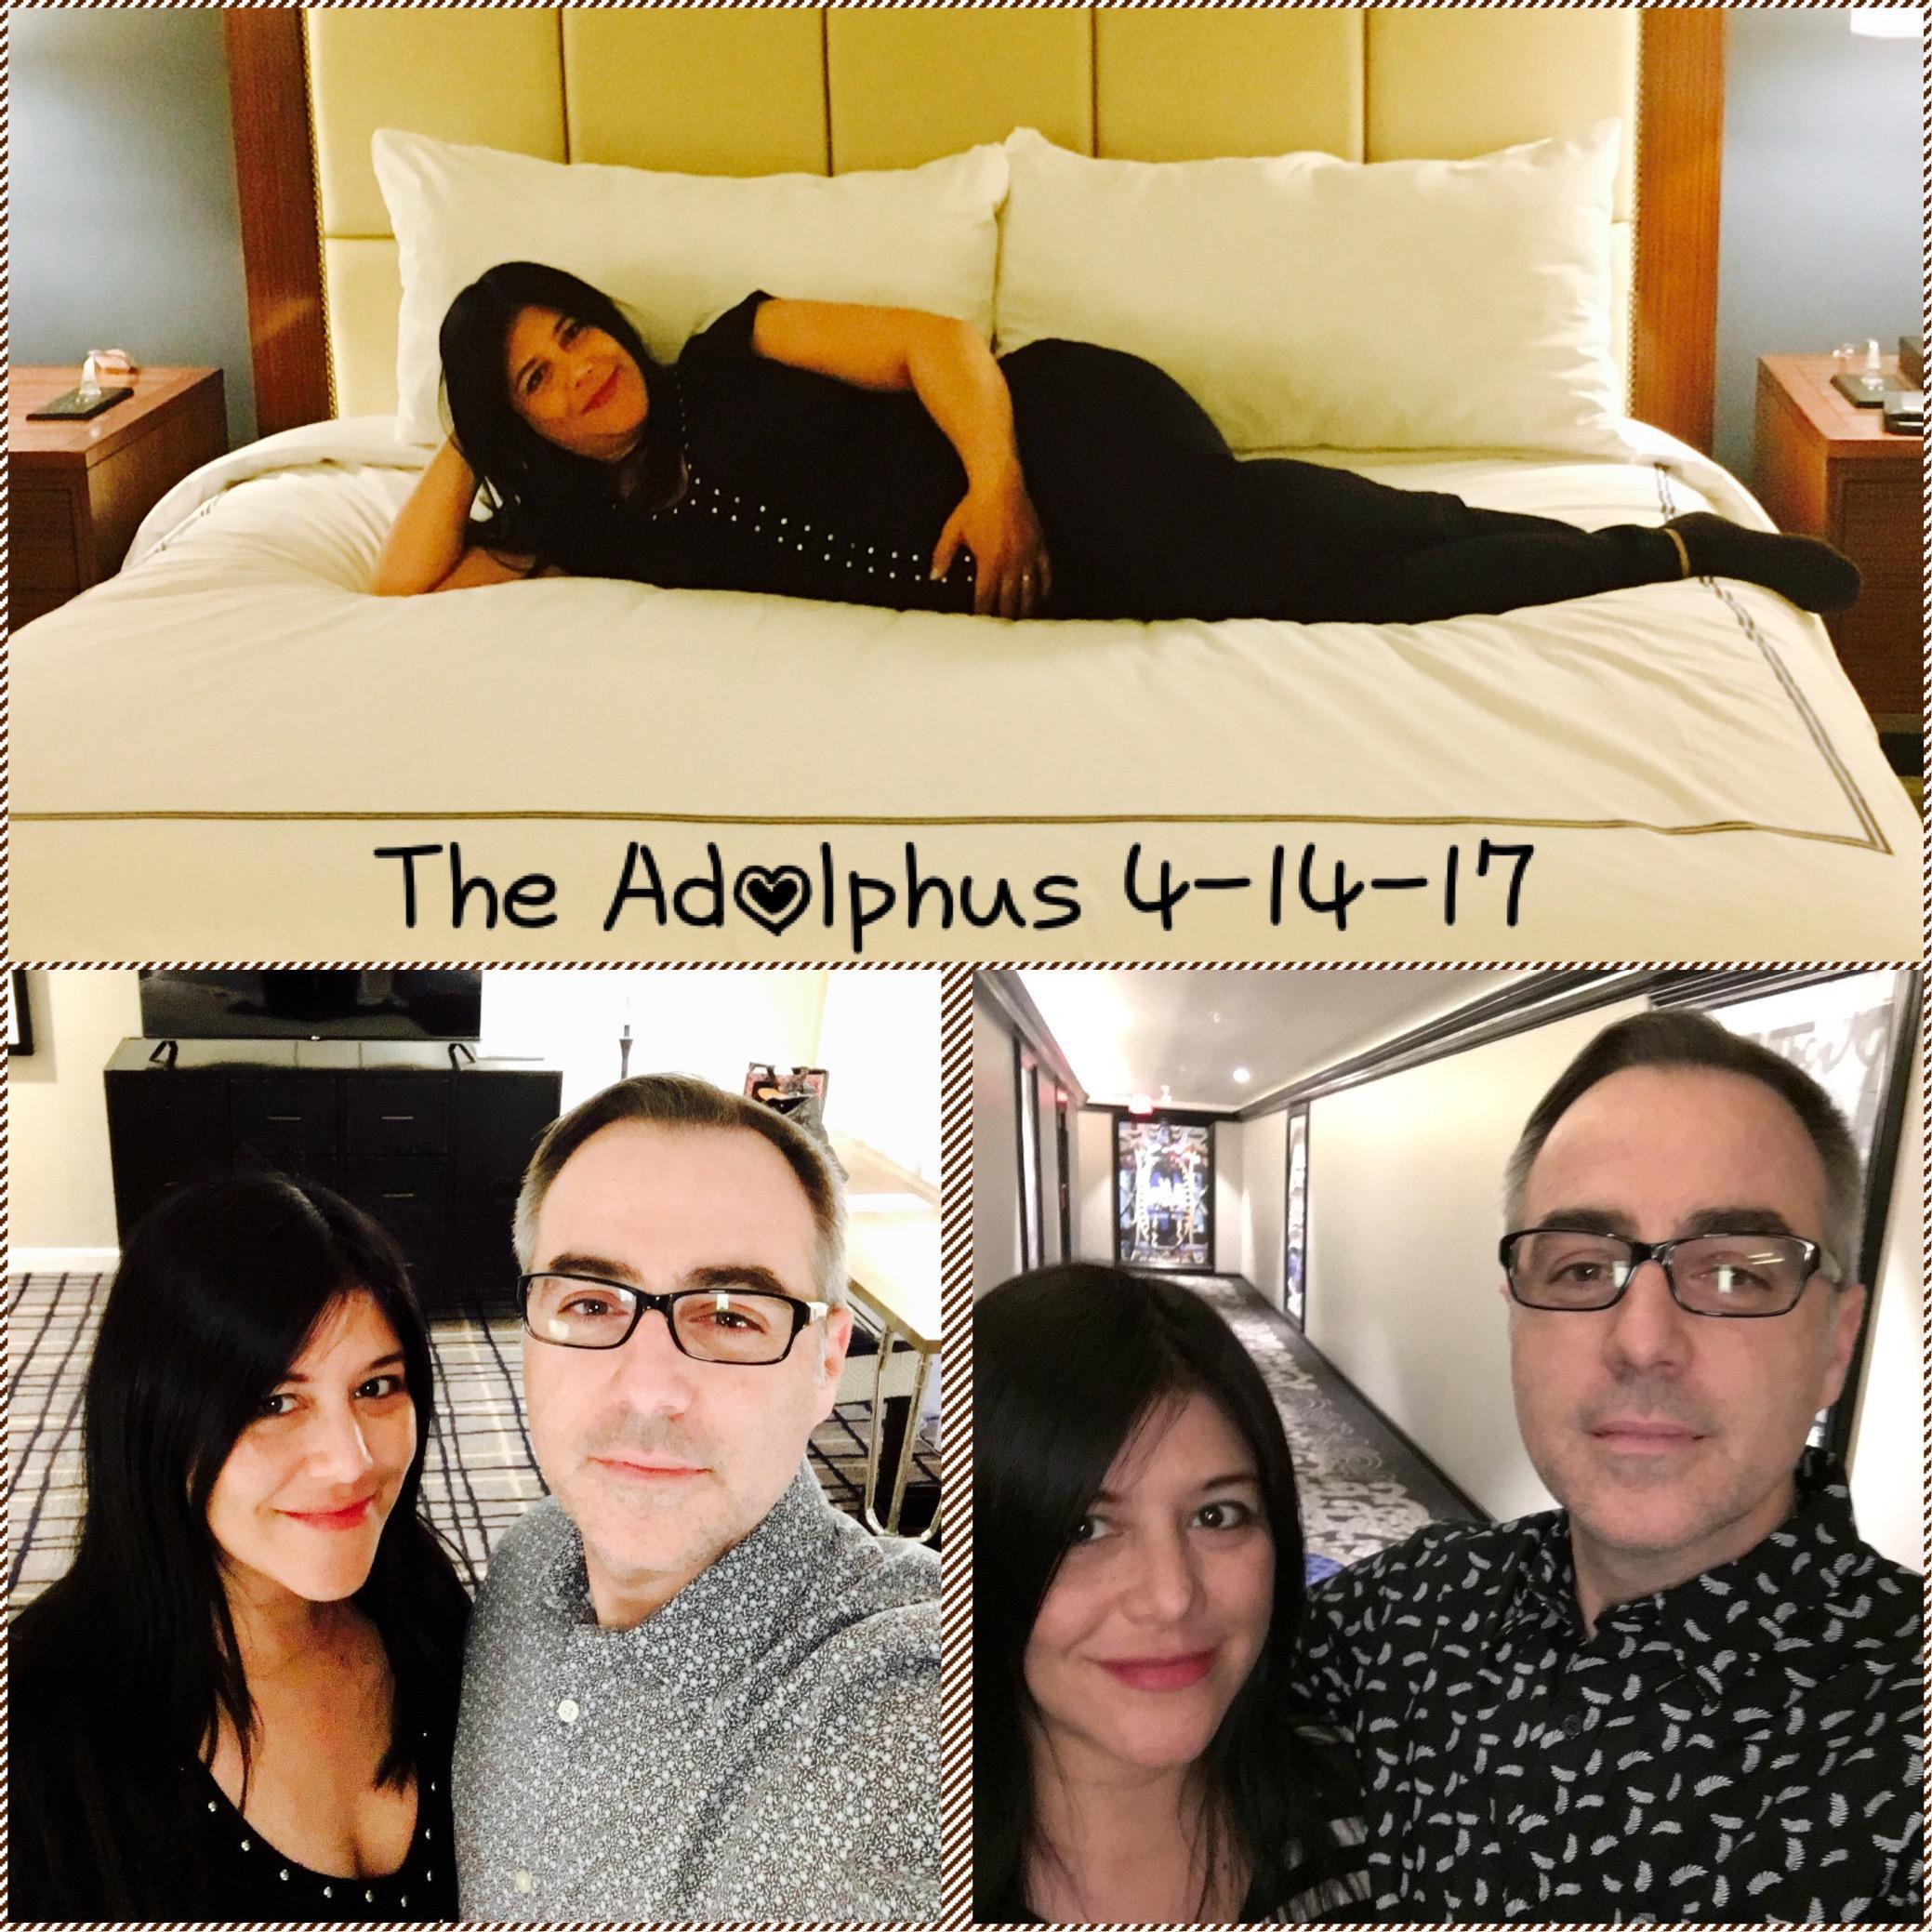 The Adolphus Experience